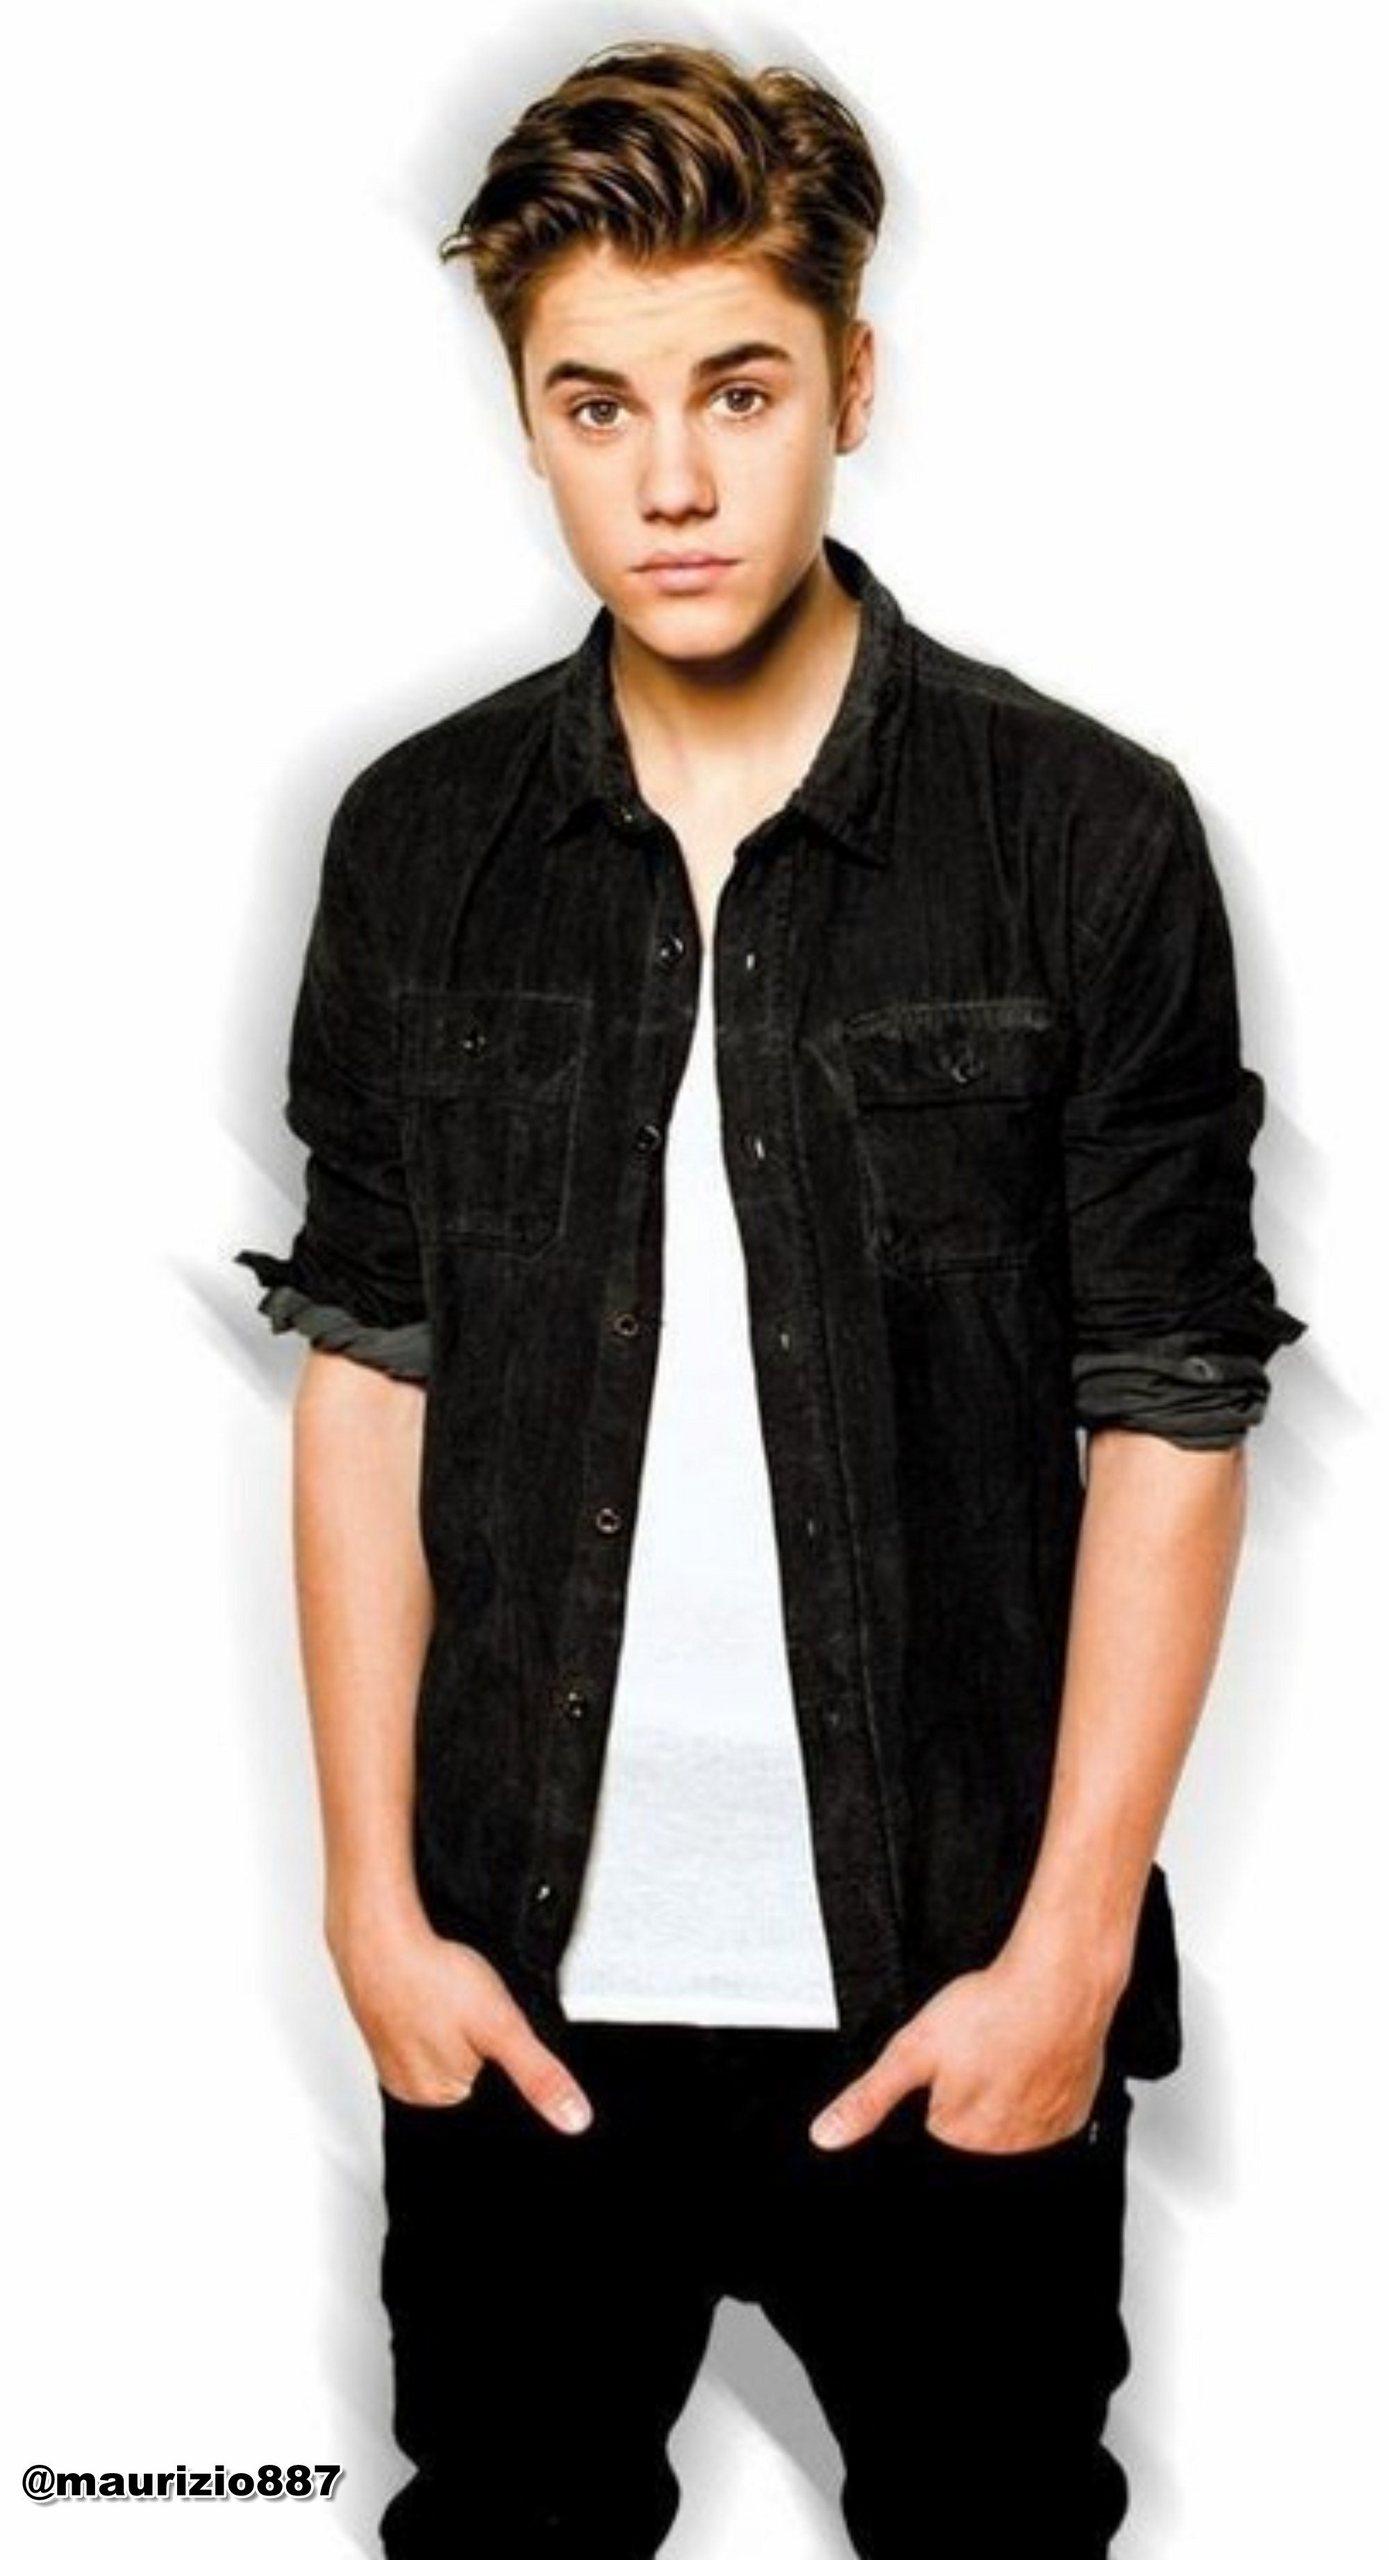 Justin Bieber images justin bieber, believe, photoshoot, , 2012 HD ...